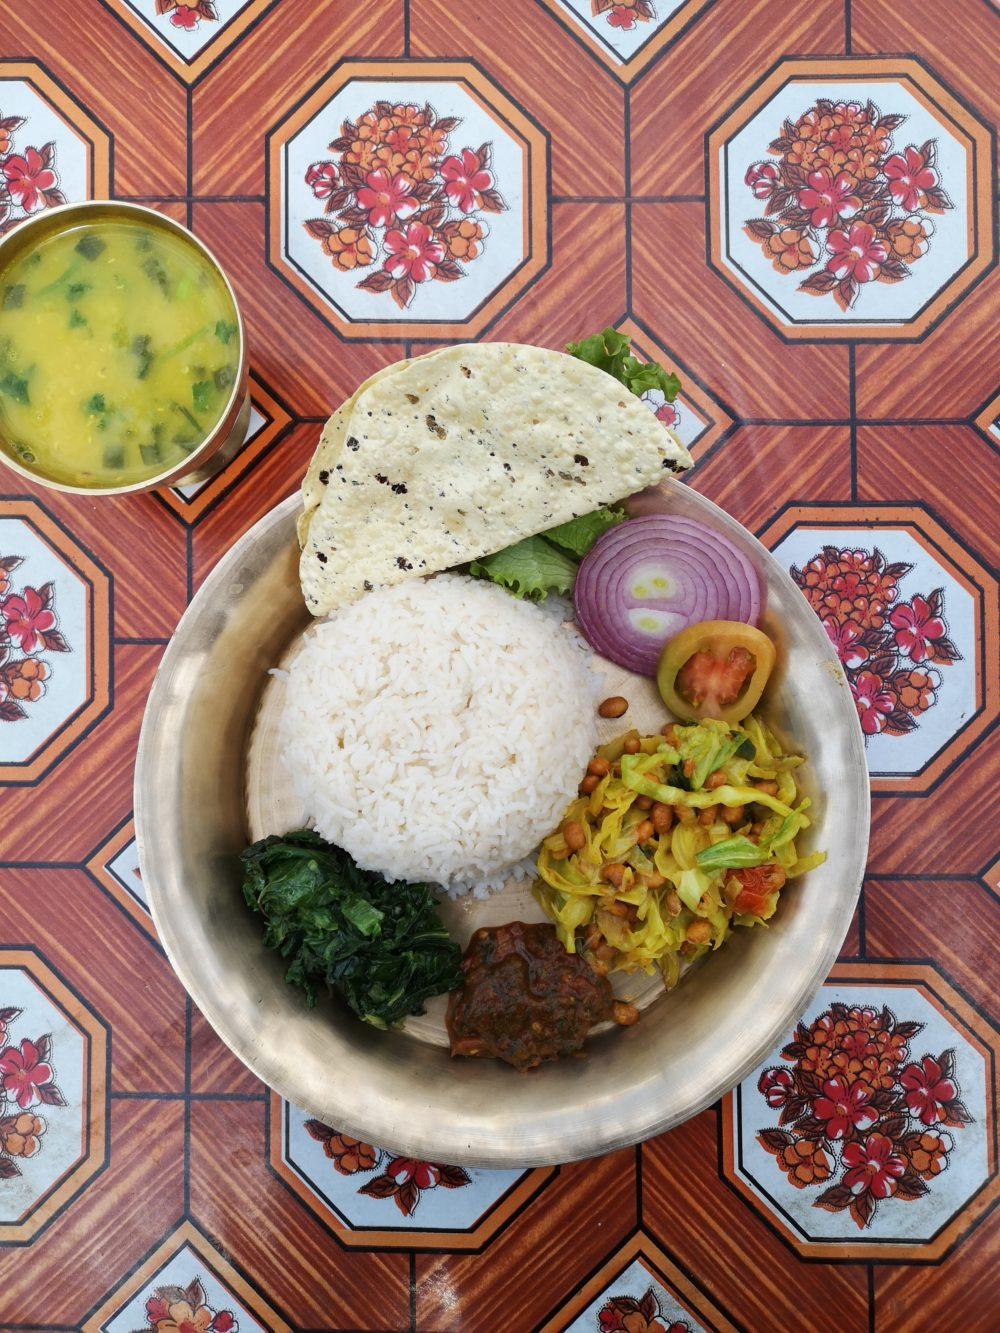 Vegetarisch Essen in Nepal: Dal Baht